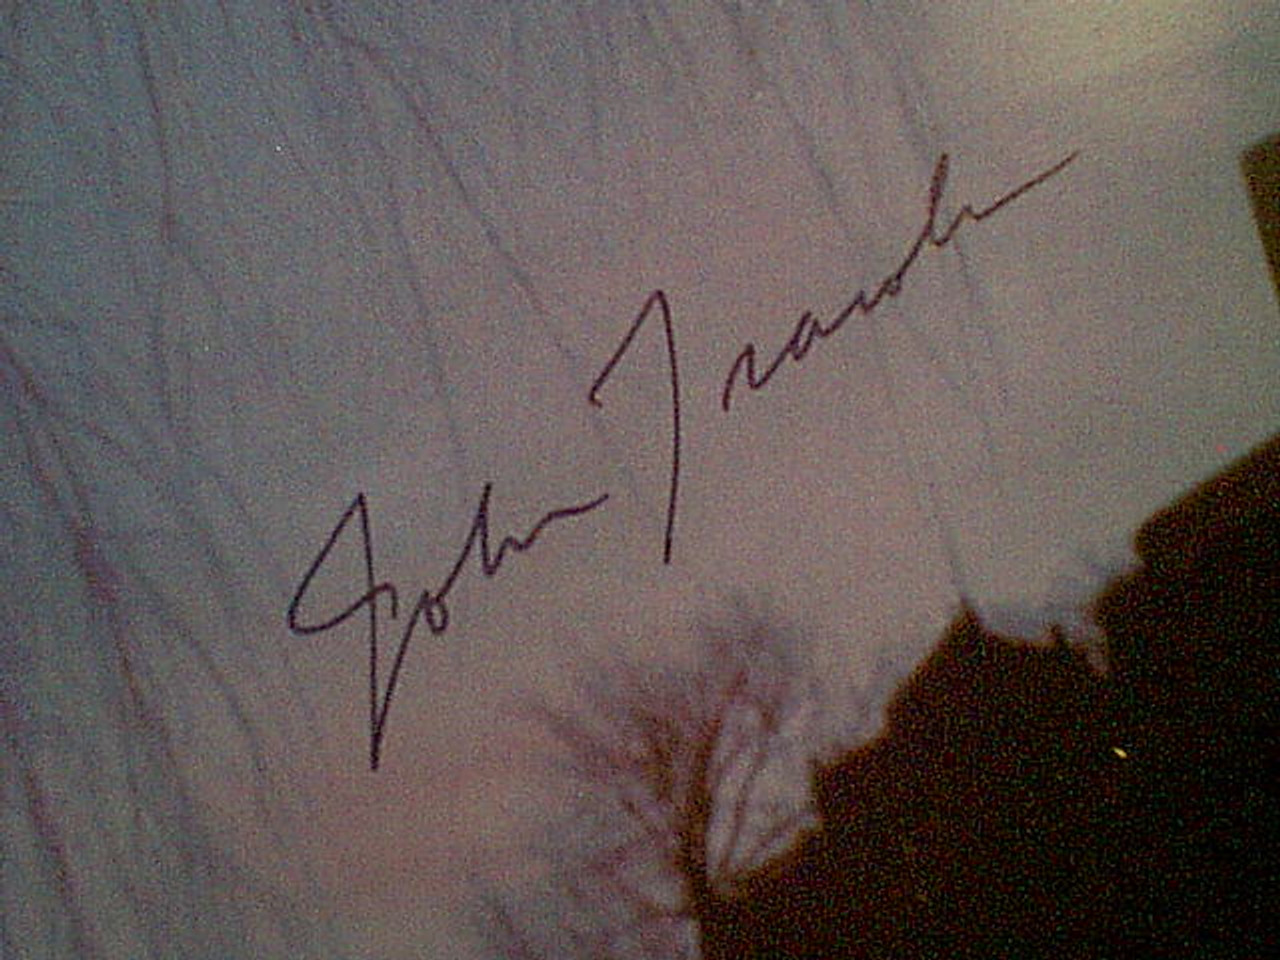 Travolta, John Color Photo Signed Autograph - Movie